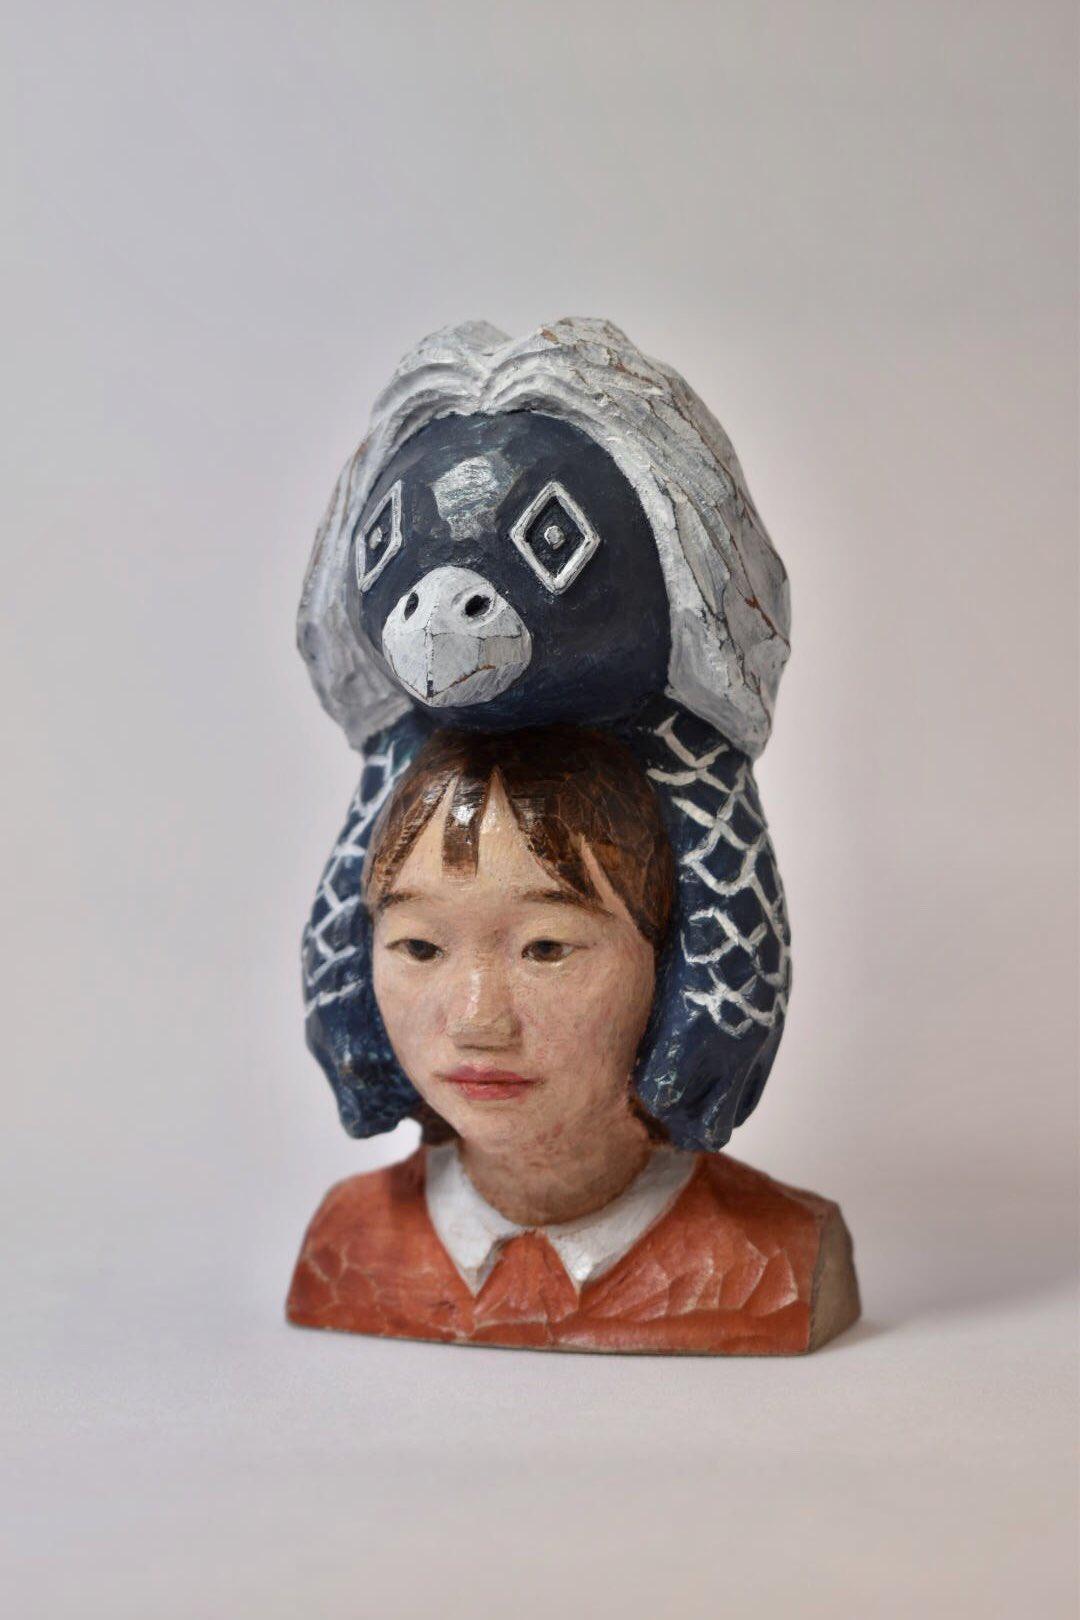 Pria Jepang - Tomoaki Ichikawa